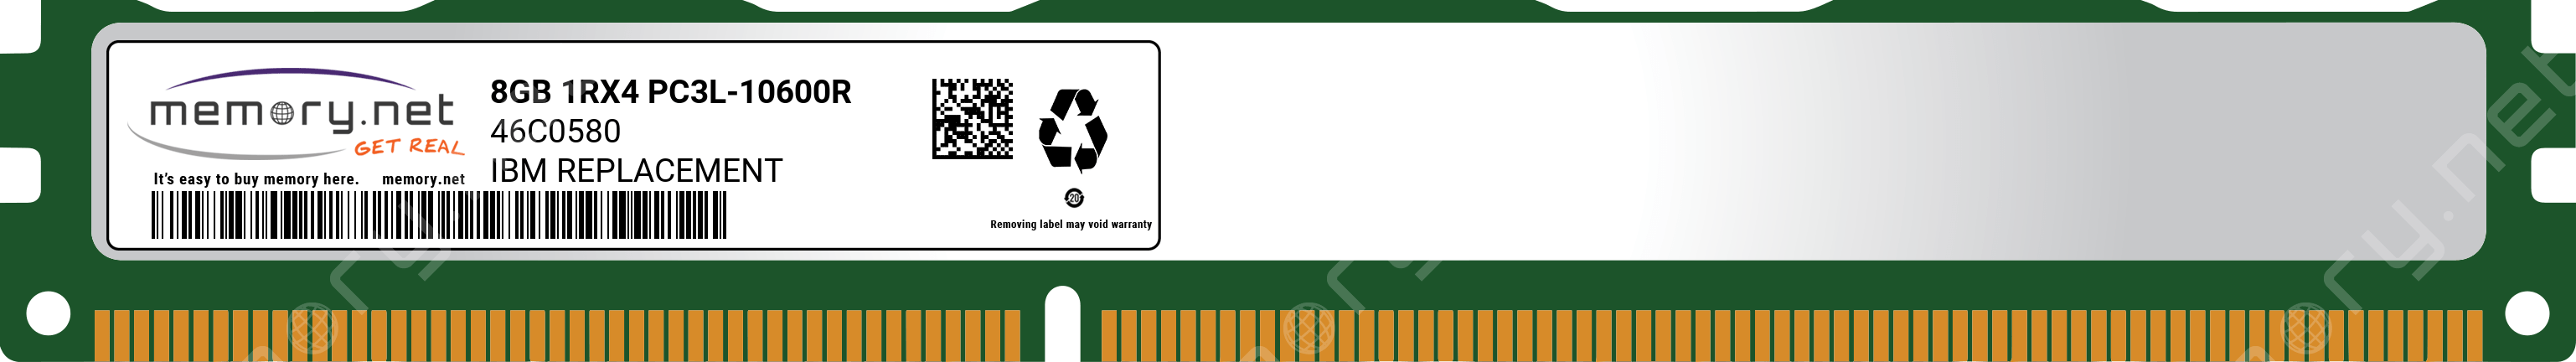 46C0580